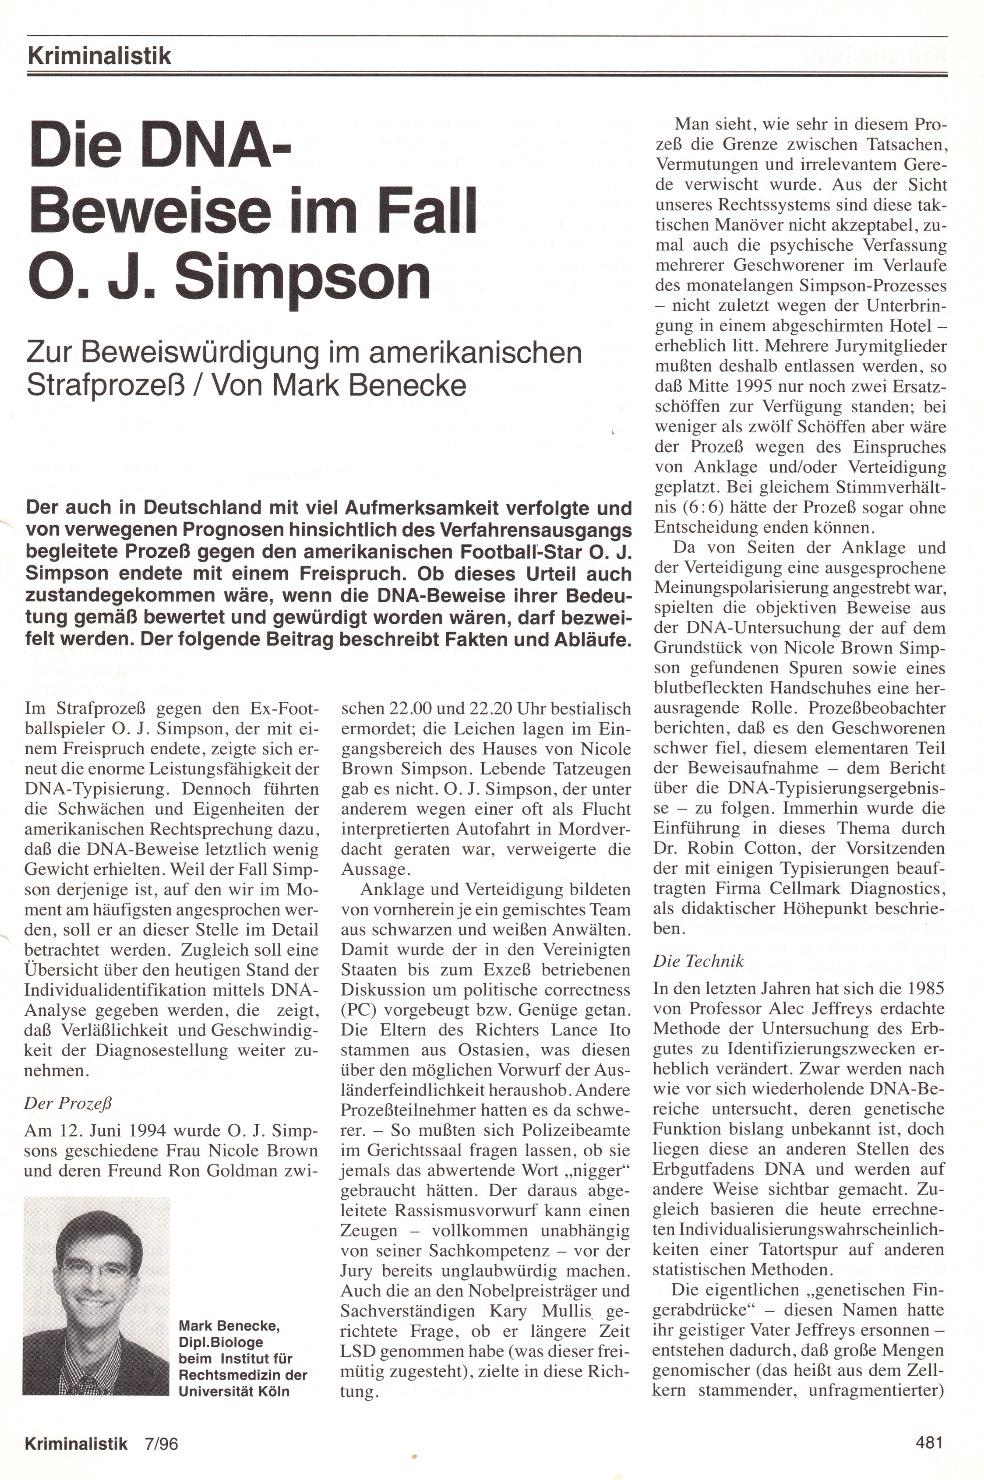 1996 Kriminalistik Die DNA Beweise Im Fall Simpson Mark Benecke